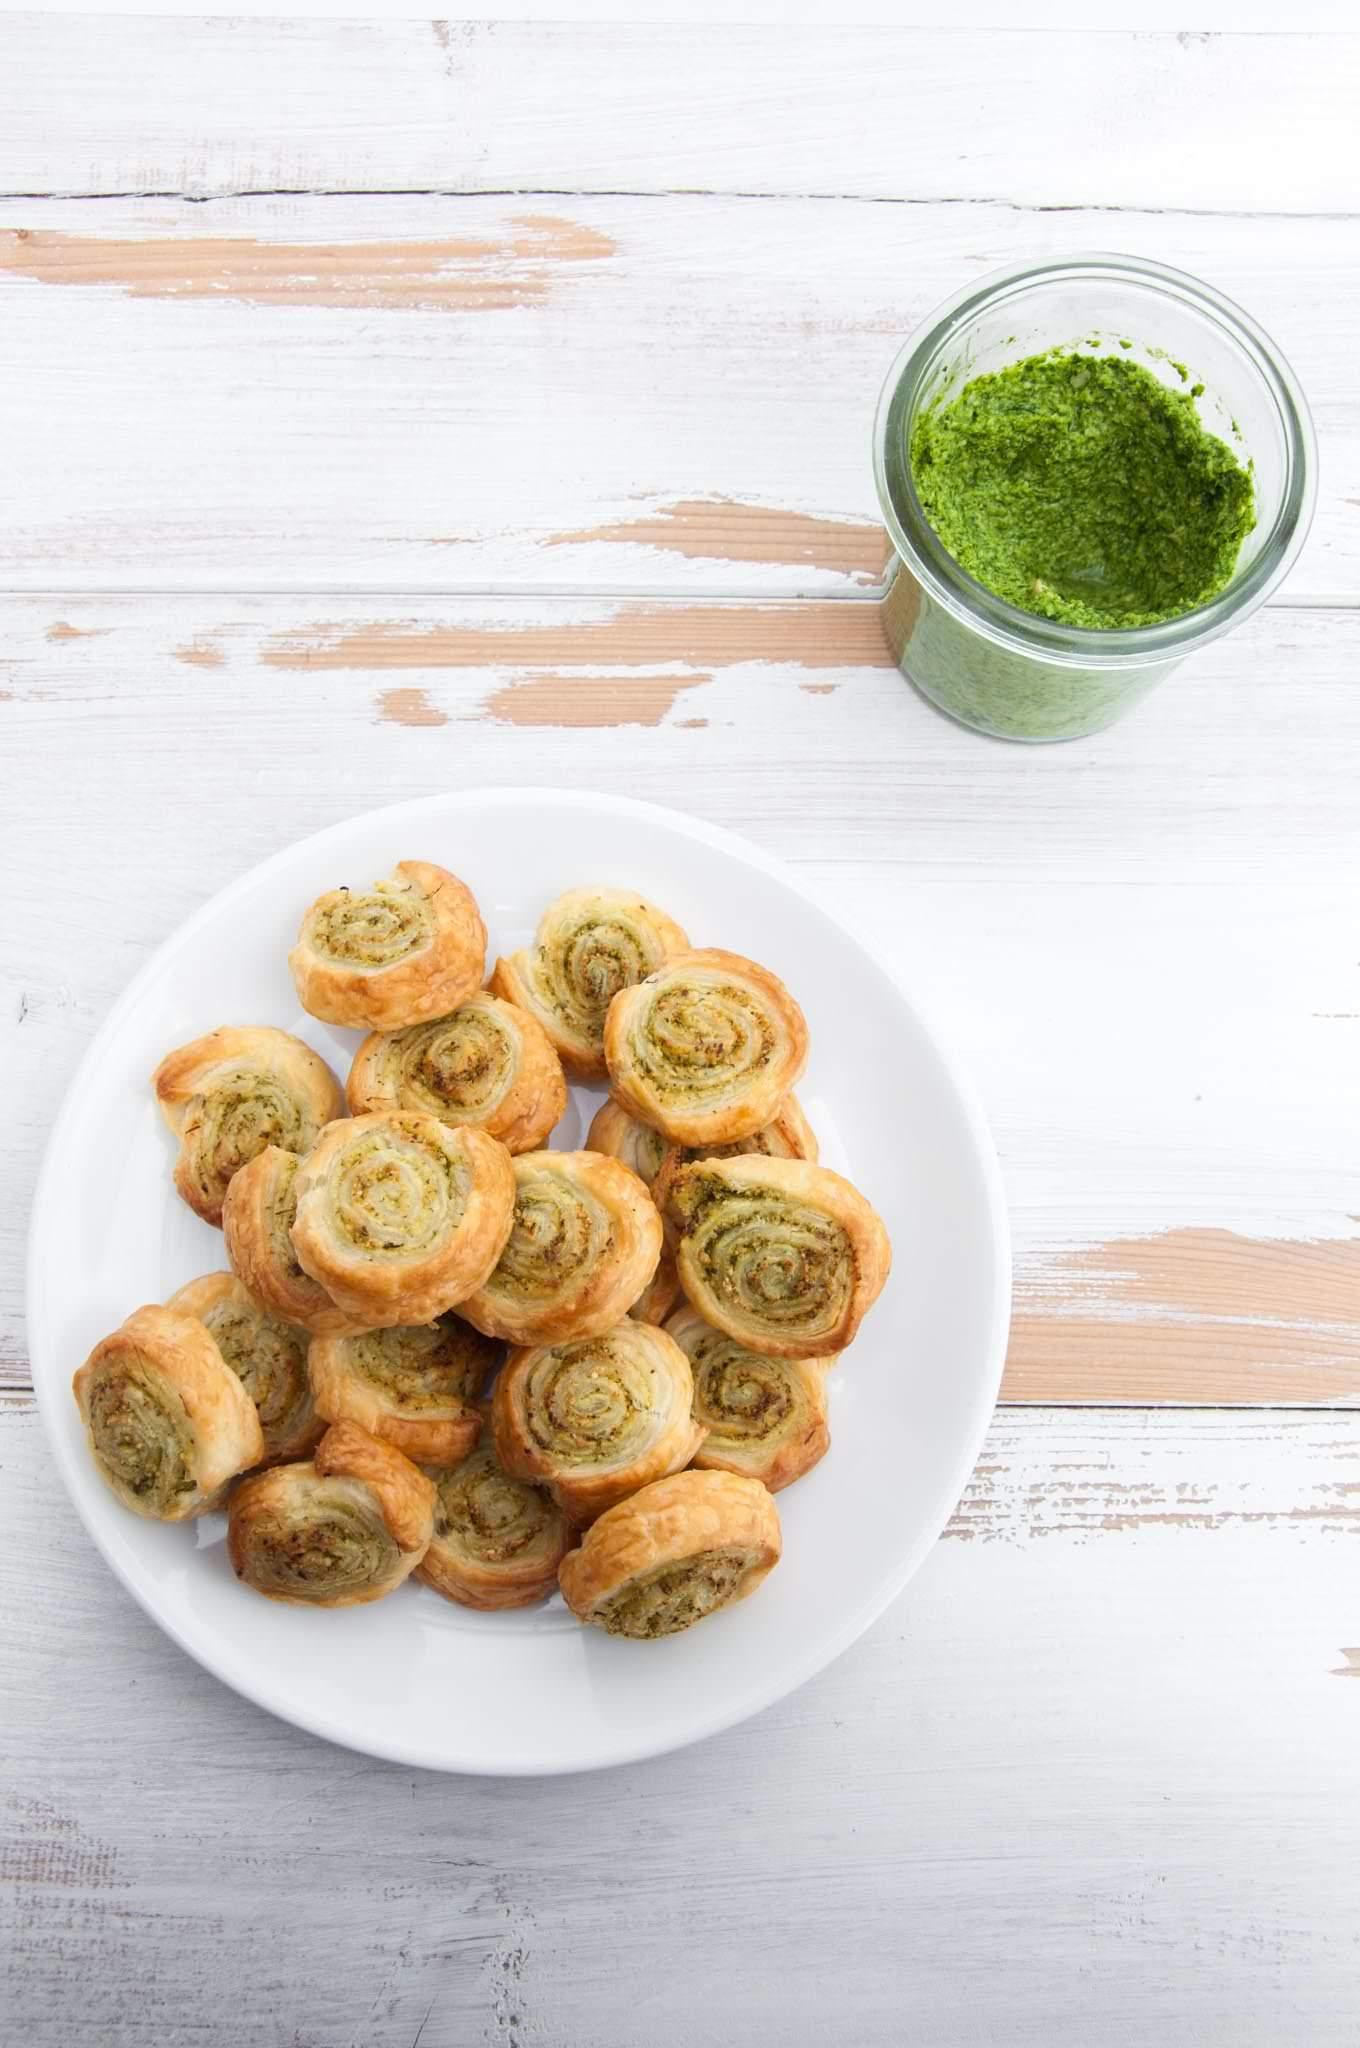 Vegan Arugula Pesto Pinwheels |ElephantasticVegan.com